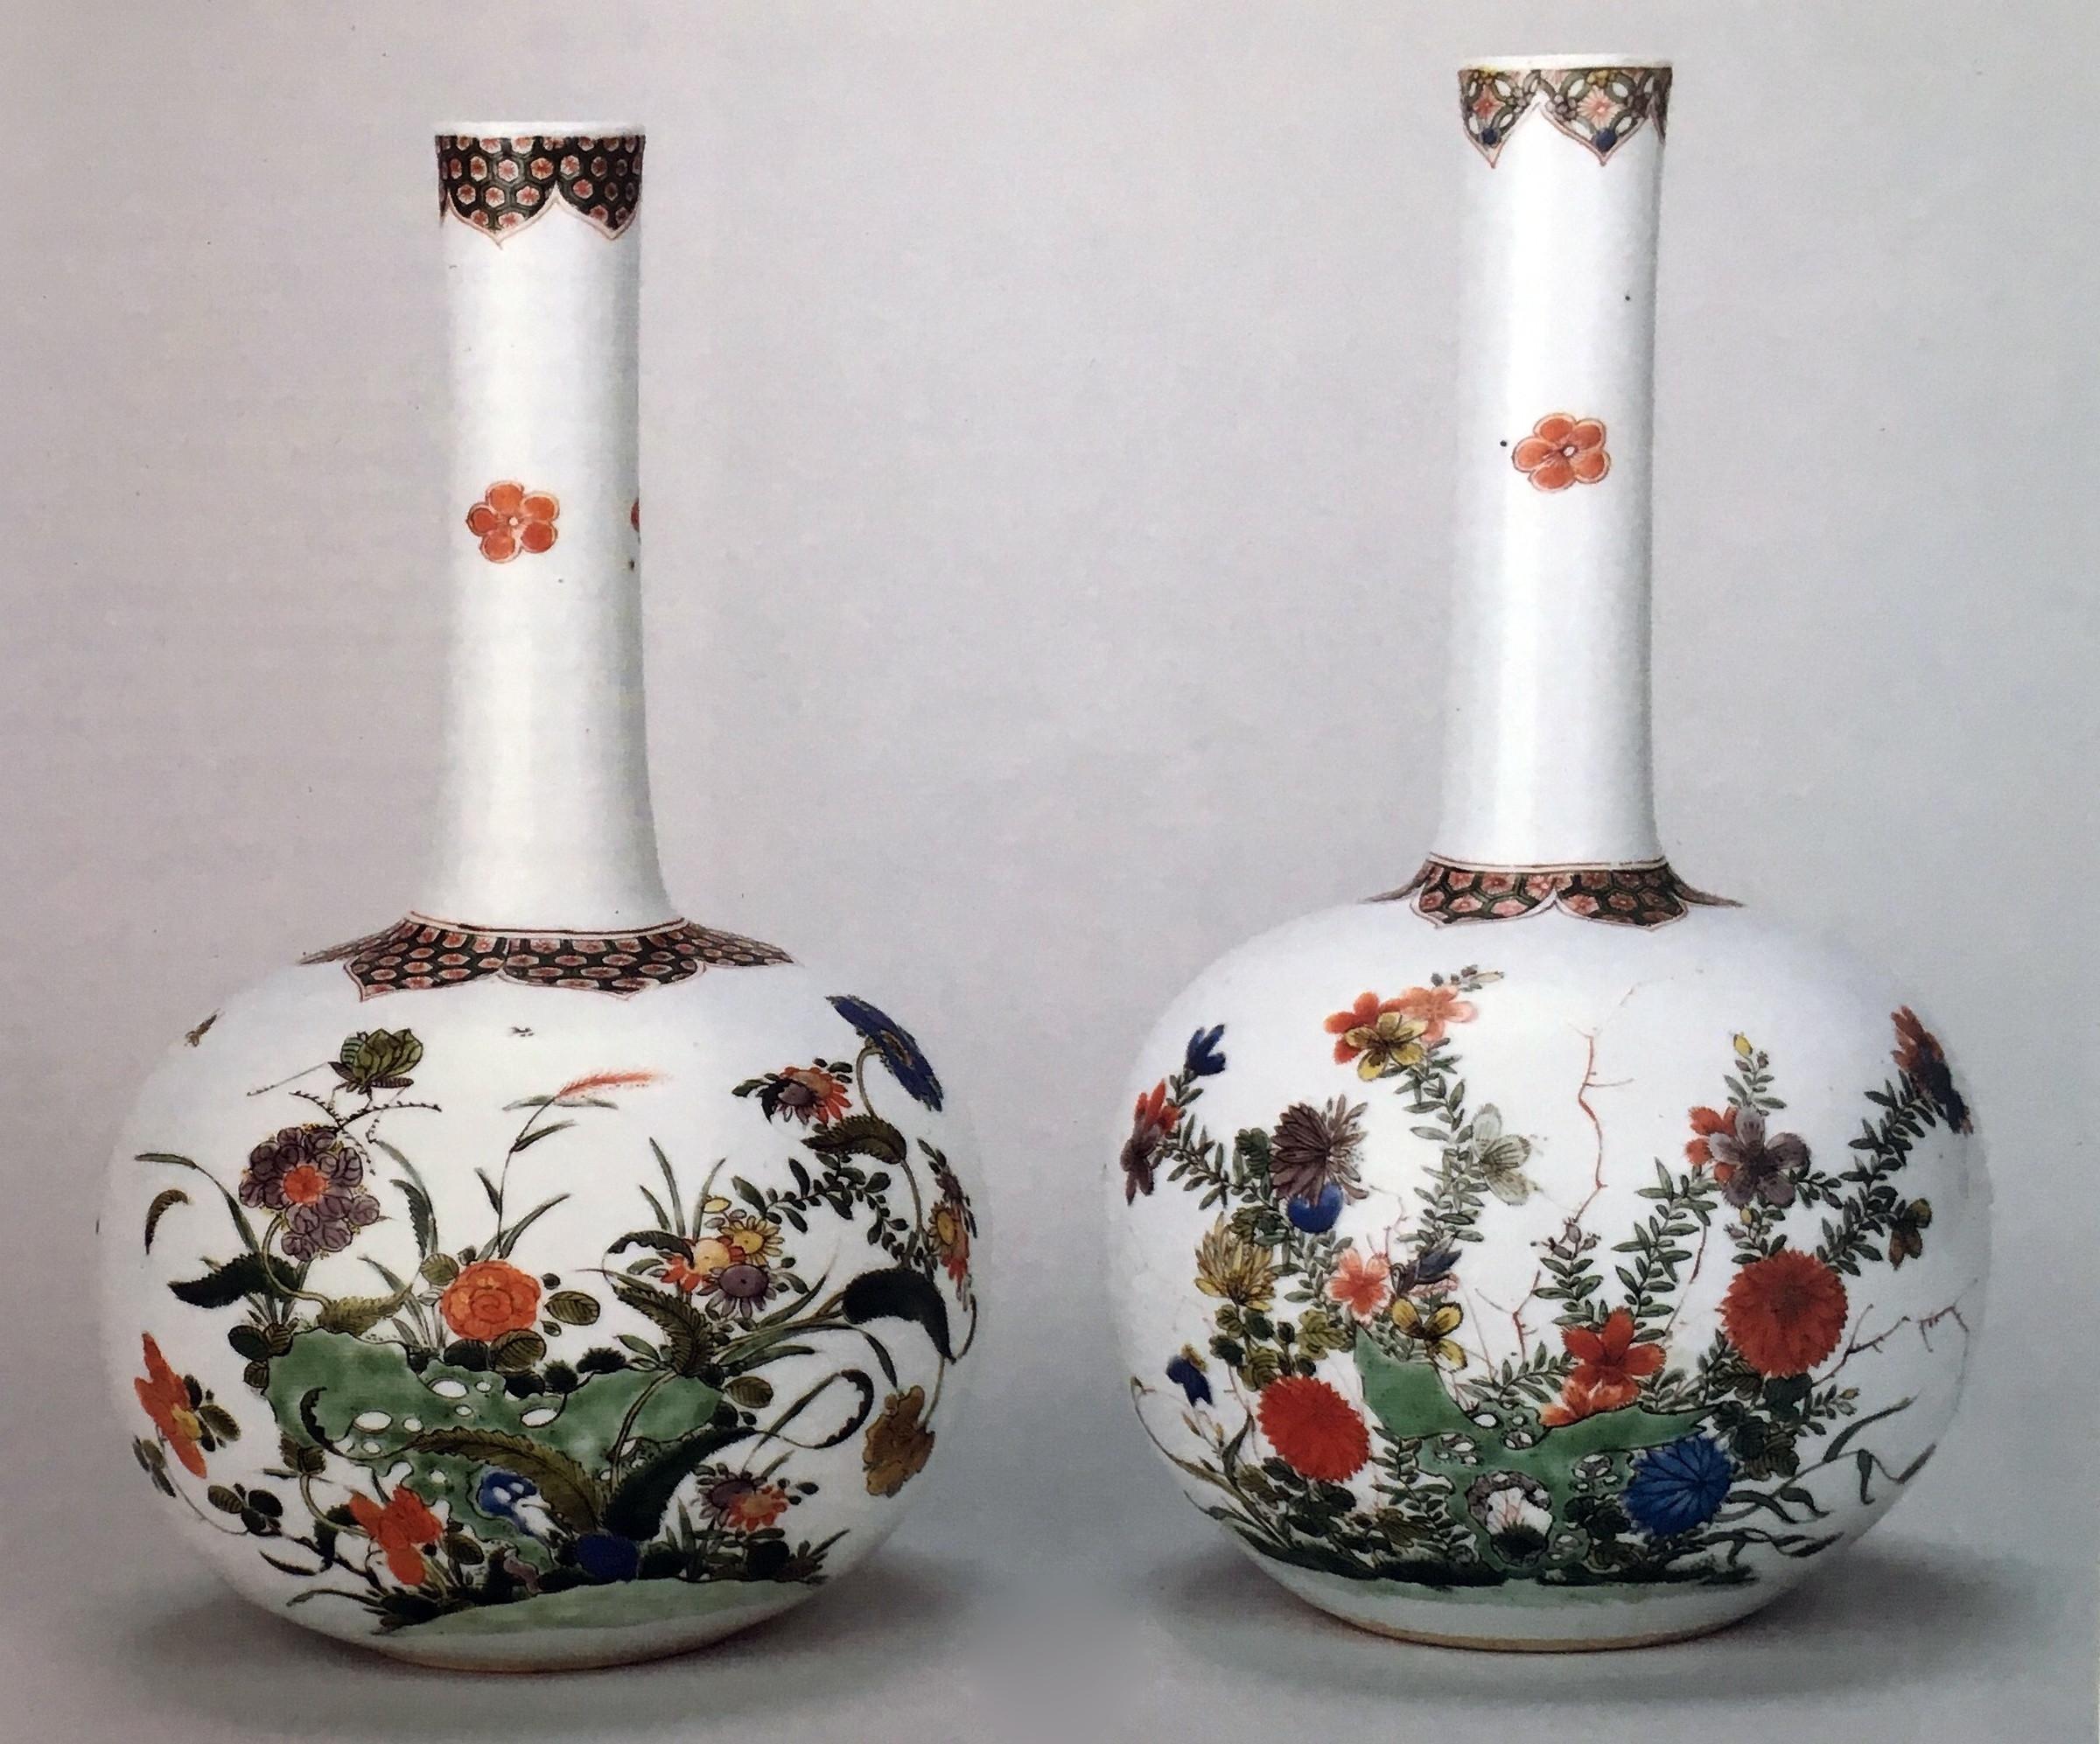 cylindrical glass vase of two rare chinese famille verte bottle vases kangxi 1662 1722 in two rare chinese famille verte bottle vases ao·c†™a¹e— 1662 1722